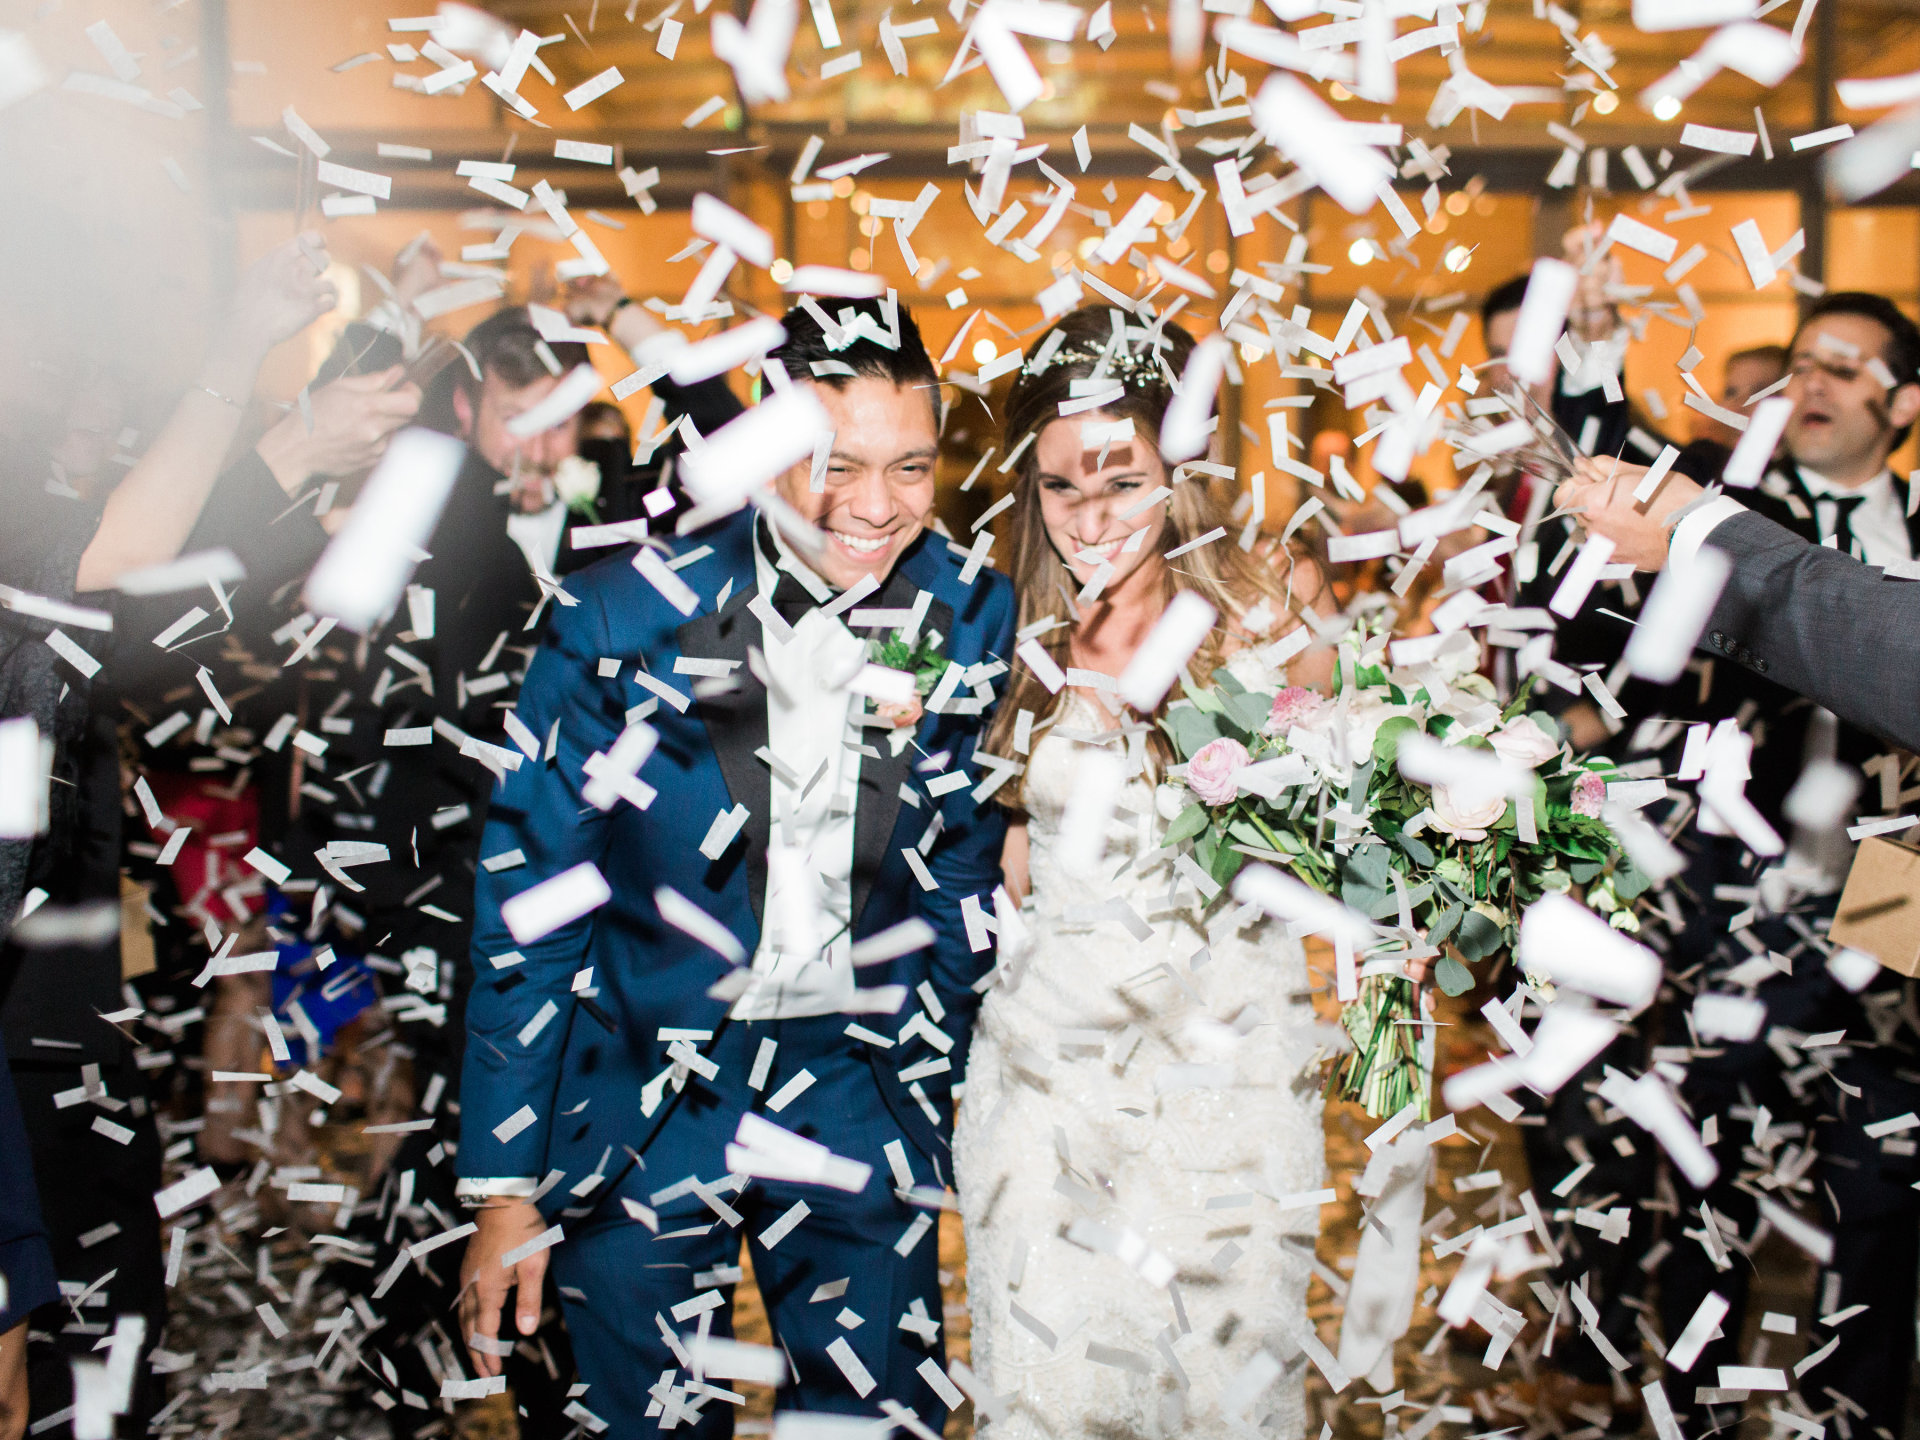 Chic Fleur Weddings and Events, Dallas Wedding Planner, Fort Worth Wedding Planner, Dallas Wedding, Fort Worth Wedding, Nasher Wedding, Nasher Sculpture Center Wedding